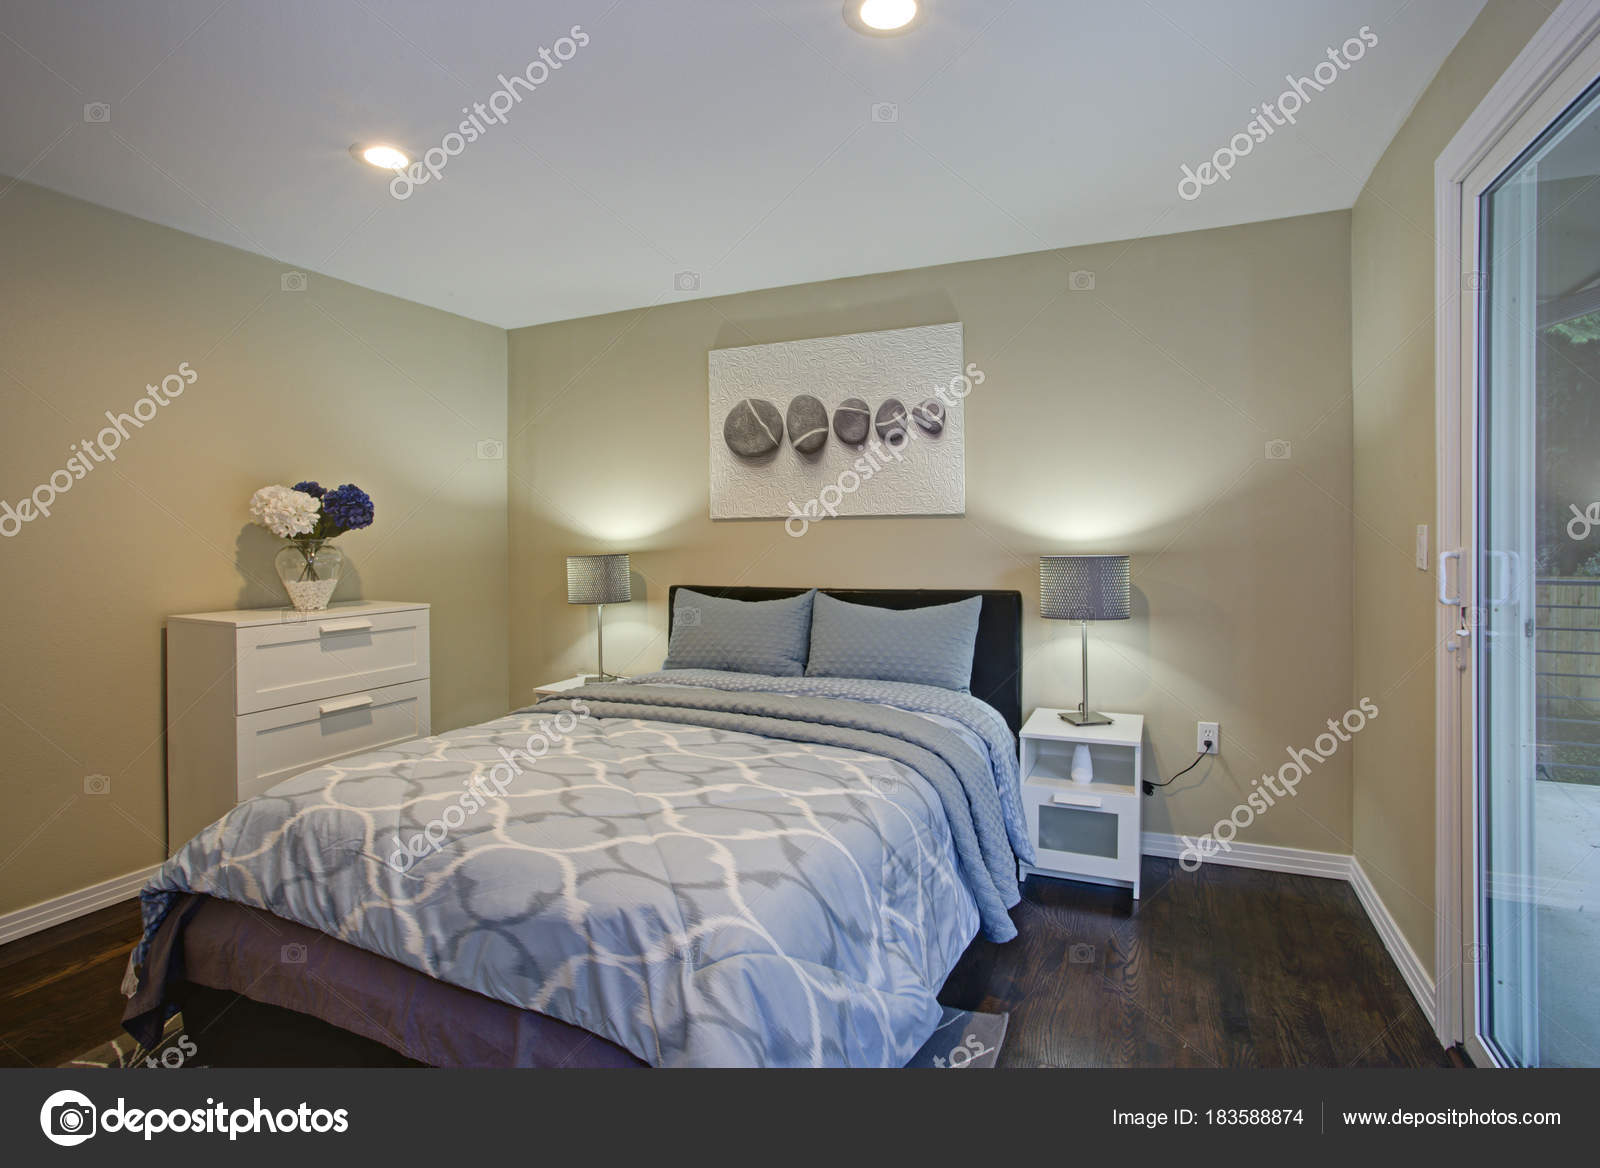 https://st3.depositphotos.com/11388938/18358/i/1600/depositphotos_183588874-stockafbeelding-tweede-etage-slaapkamer-met-taupe.jpg